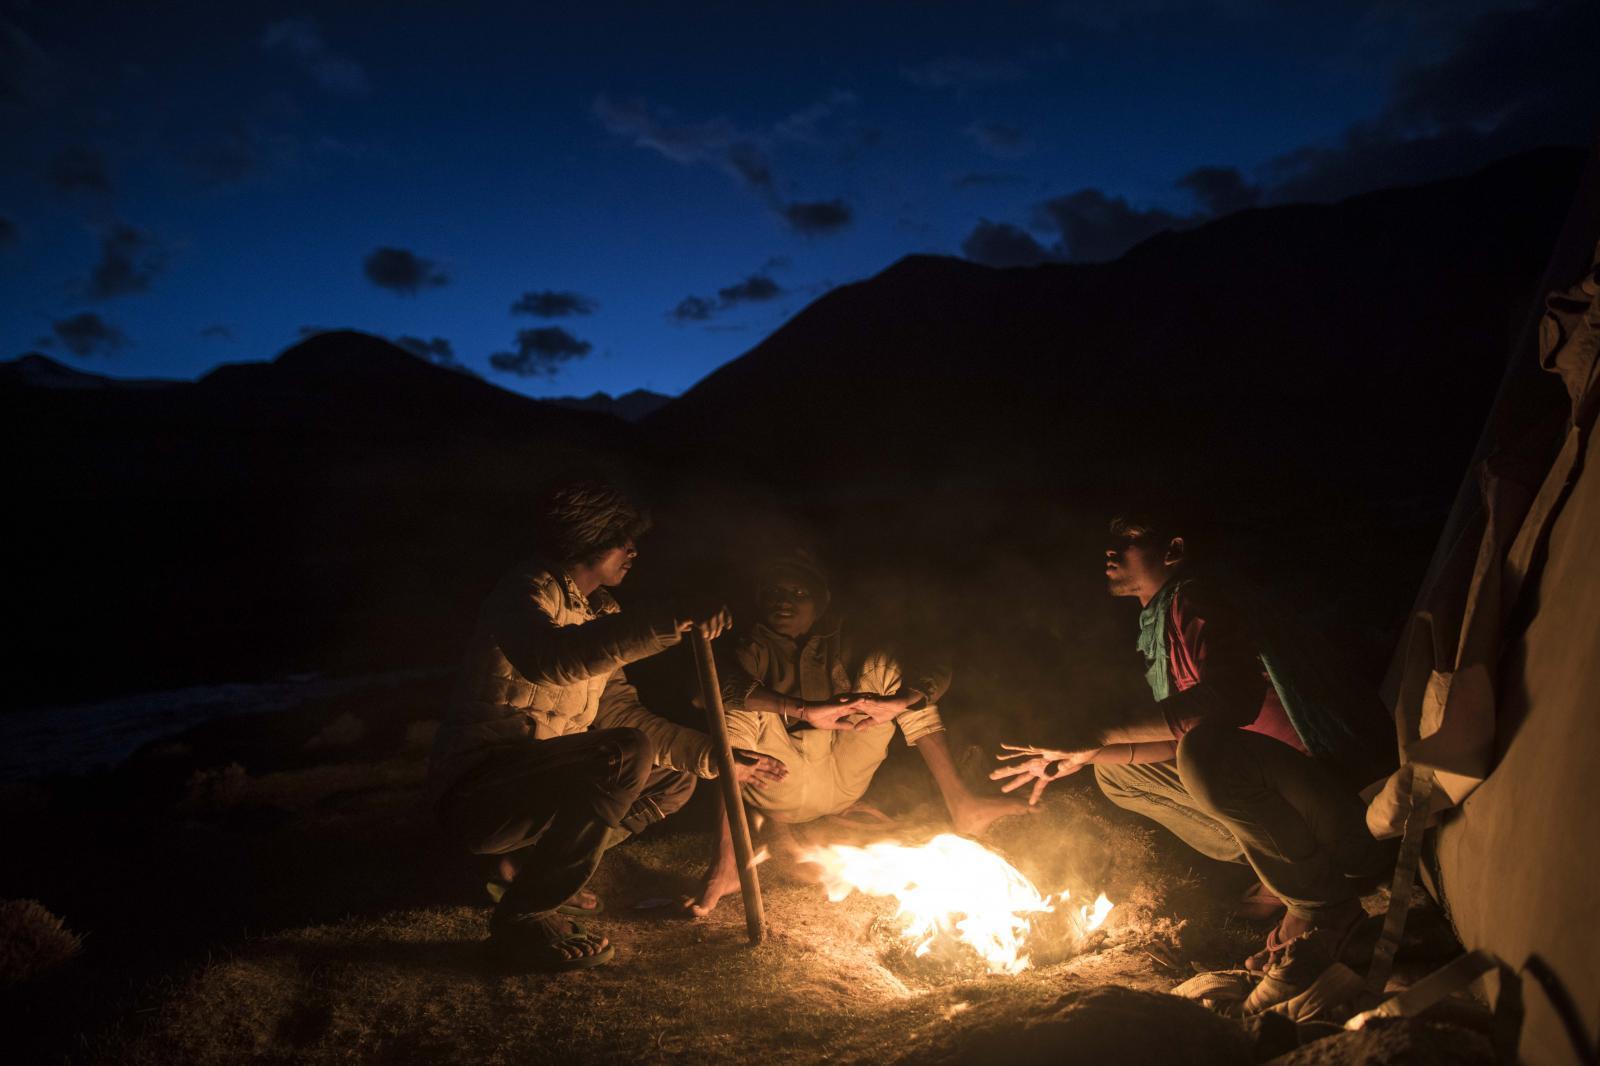 (L-R) Chota Montu, 25, Raj Kumar, 19, and Raju Dheri, 19, road maintenance workers Jharkhand state, warm up around a bonfire at their campsite near Tangtse village in northern India's Ladakh region.